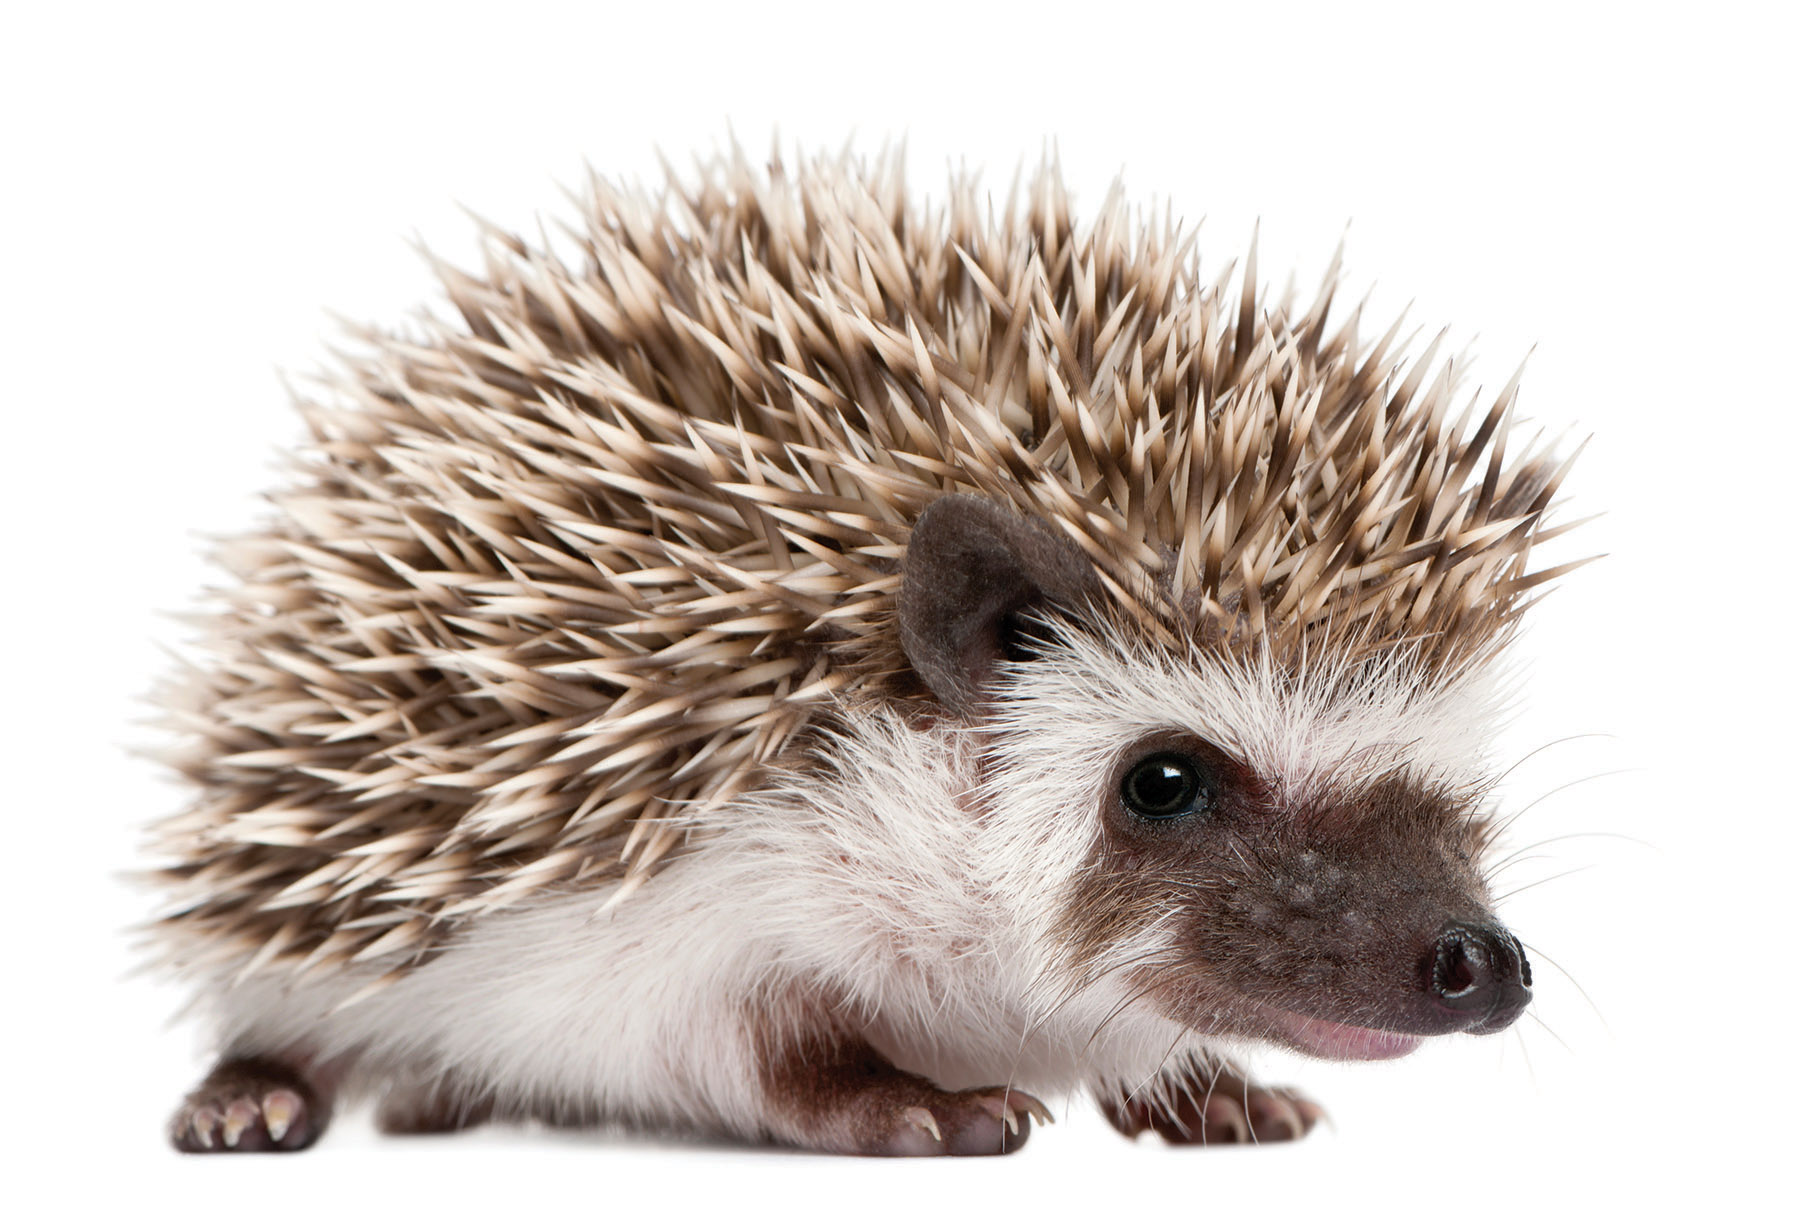 The African Pygmy Hedgehog